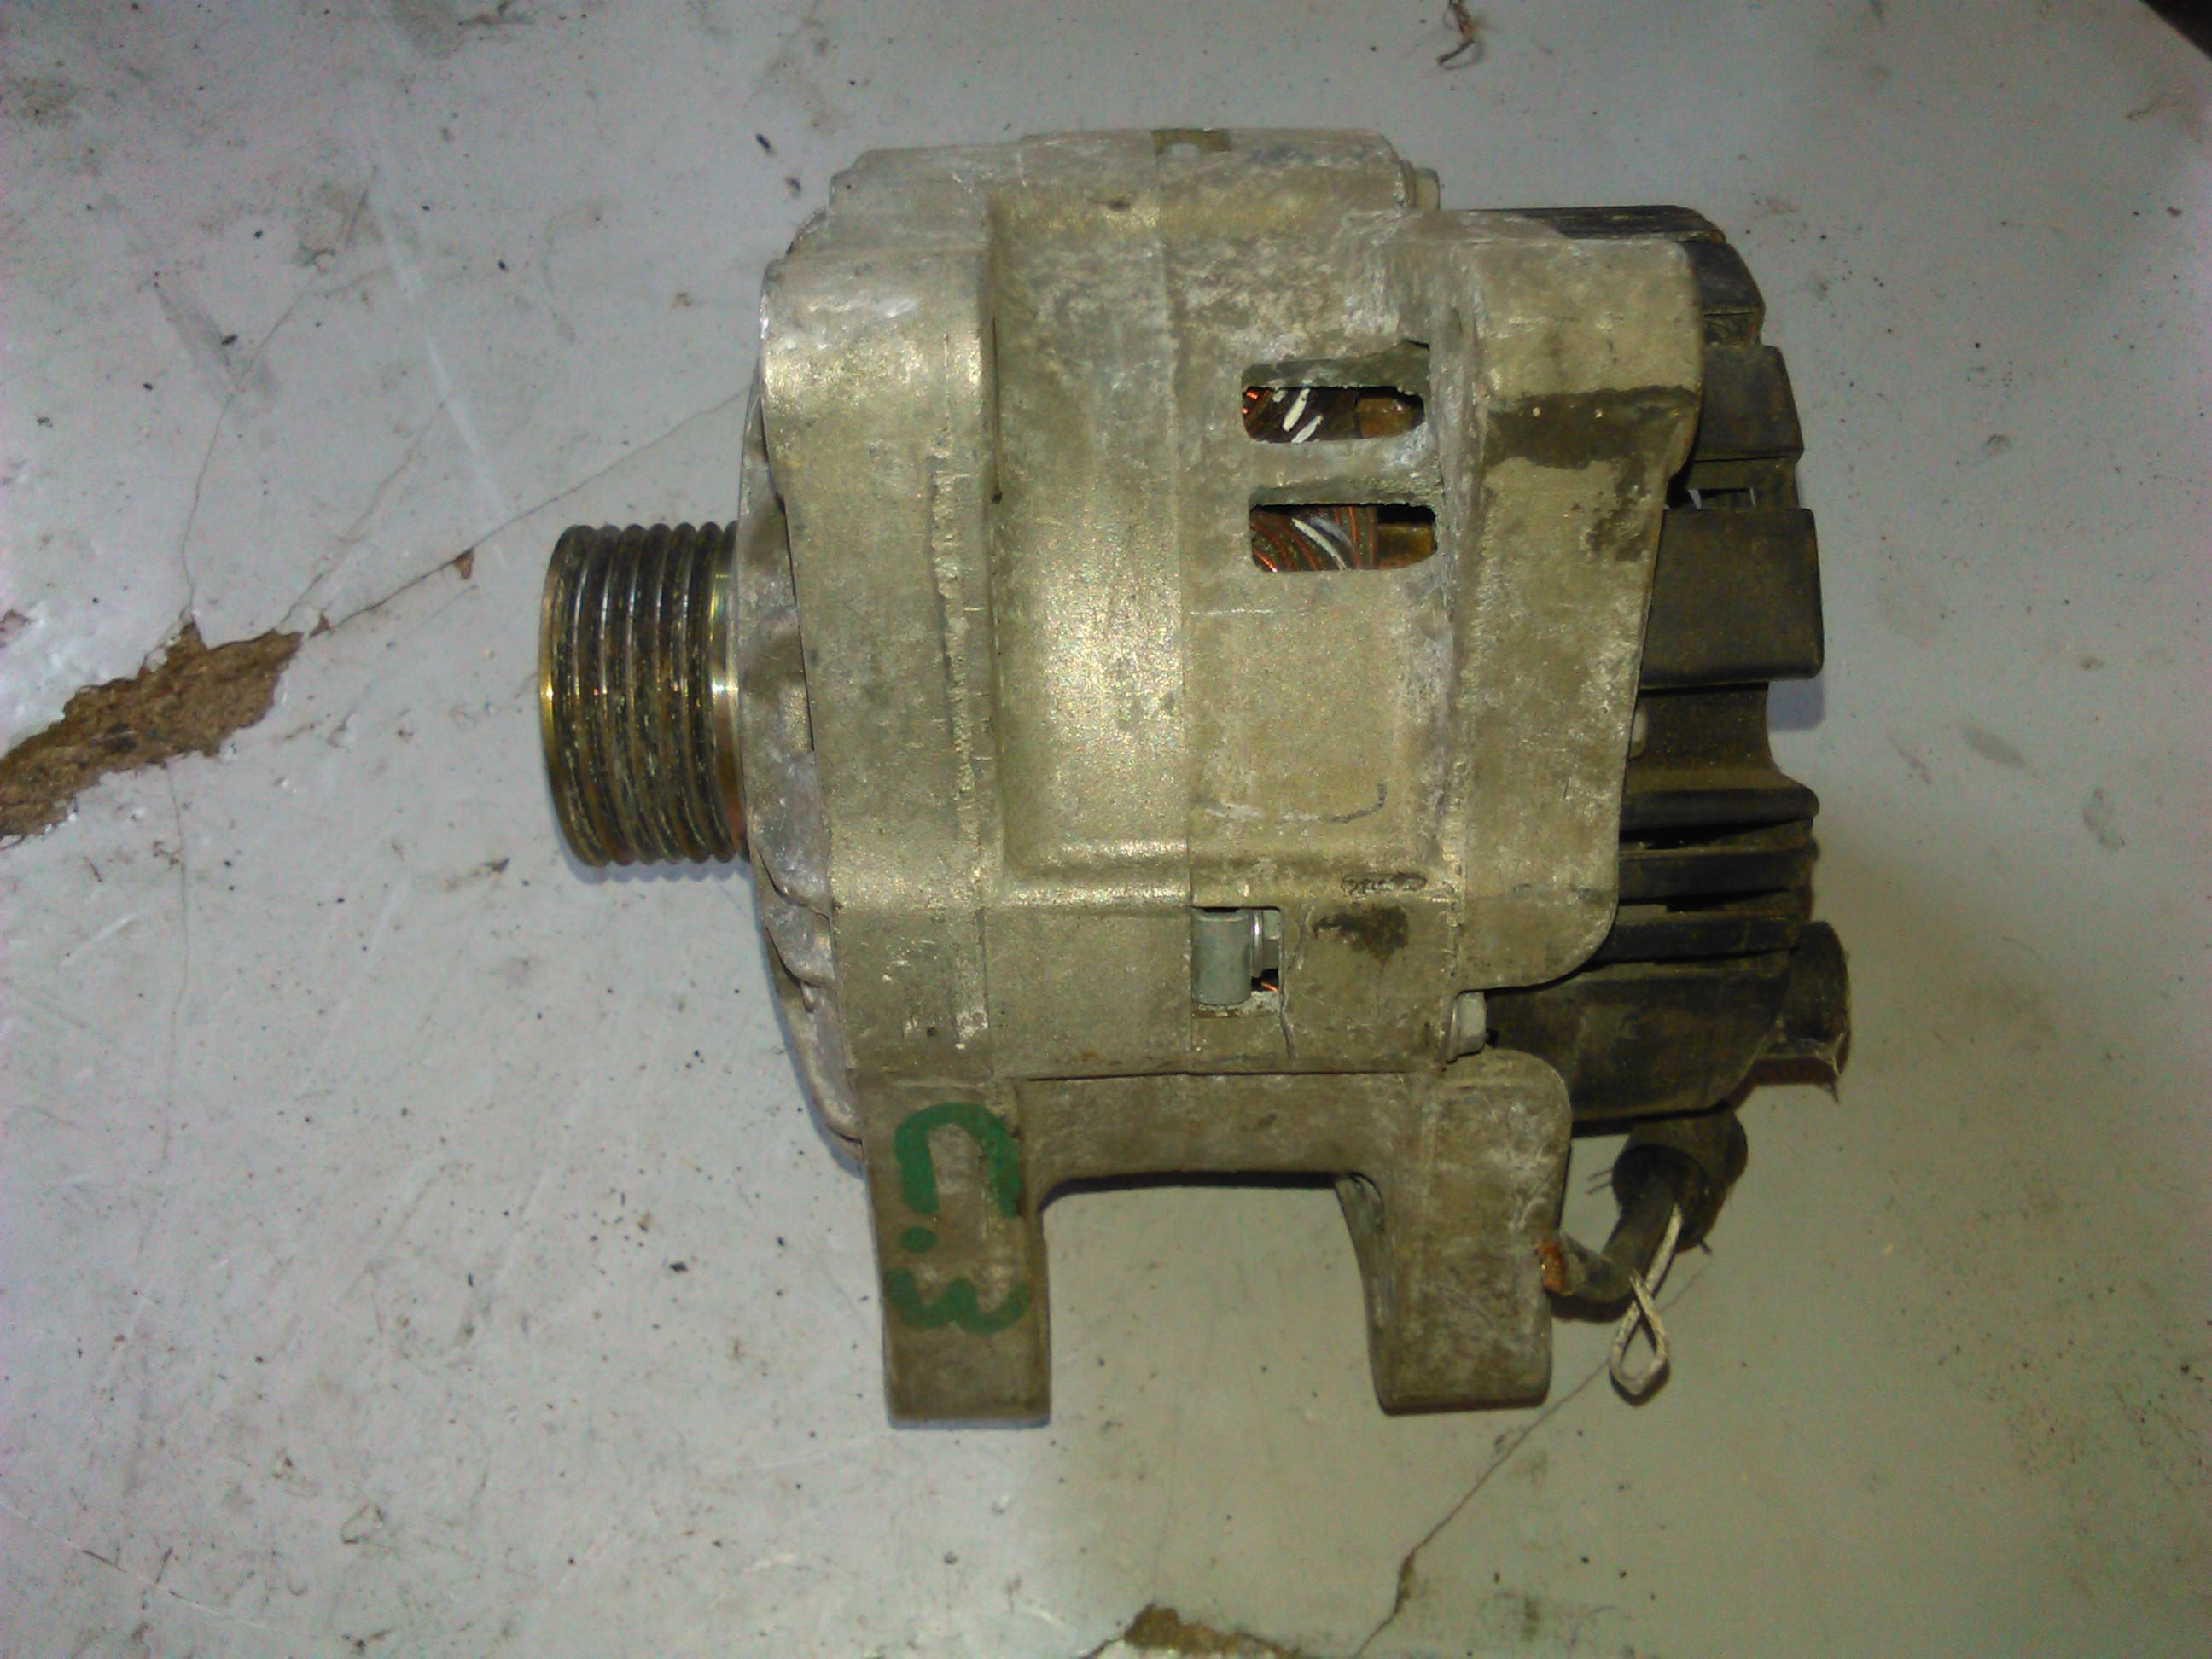 Alternator Citroen C3 1.4 16v, C4 1.4 16v cod 9649611780